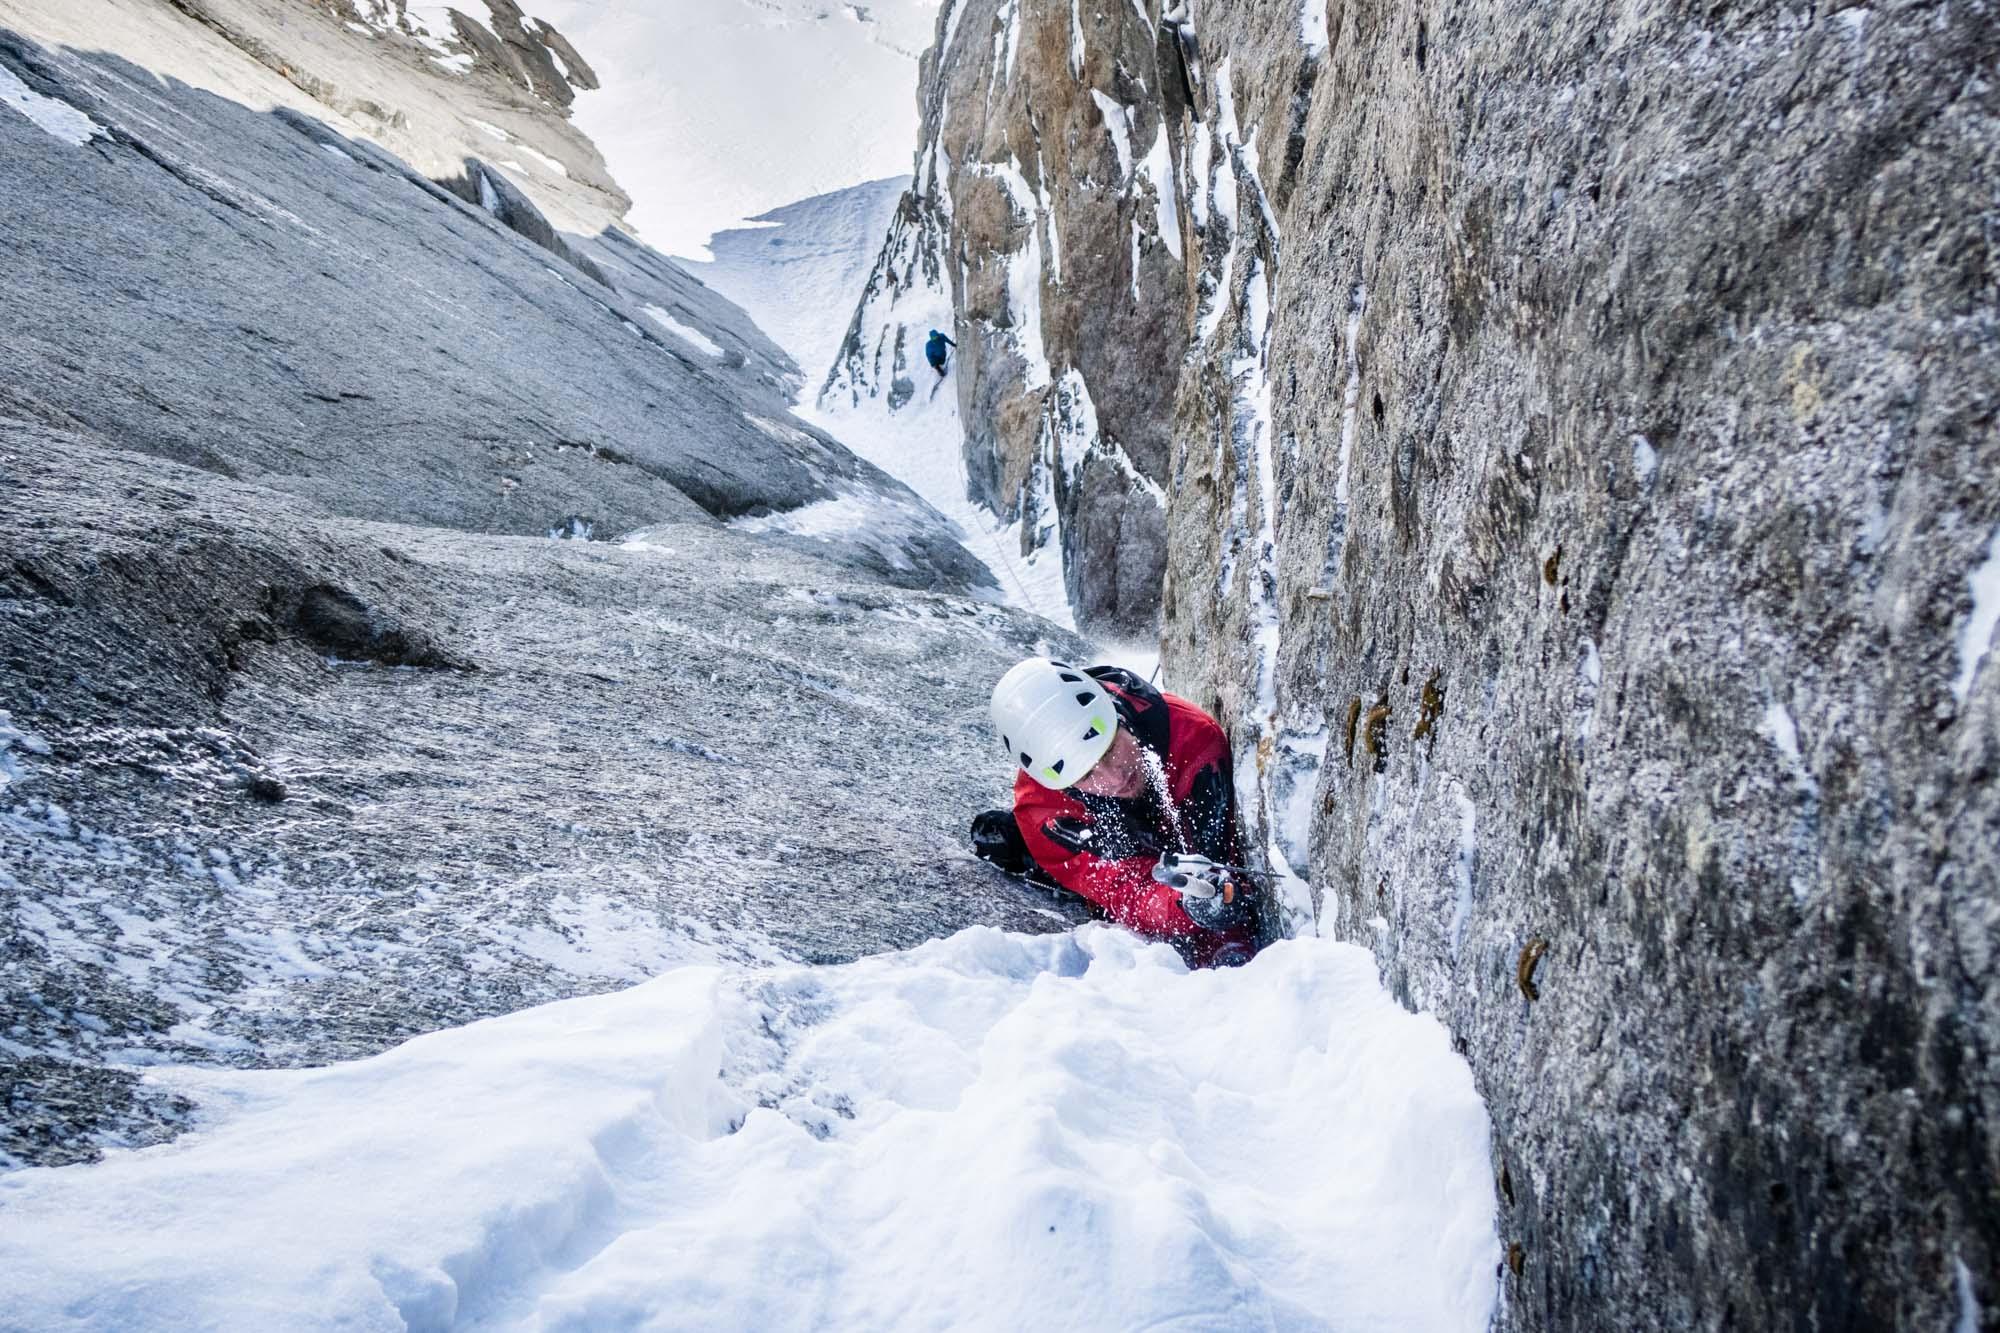 ALPINIST: Winterbergsteigen in Chamonix